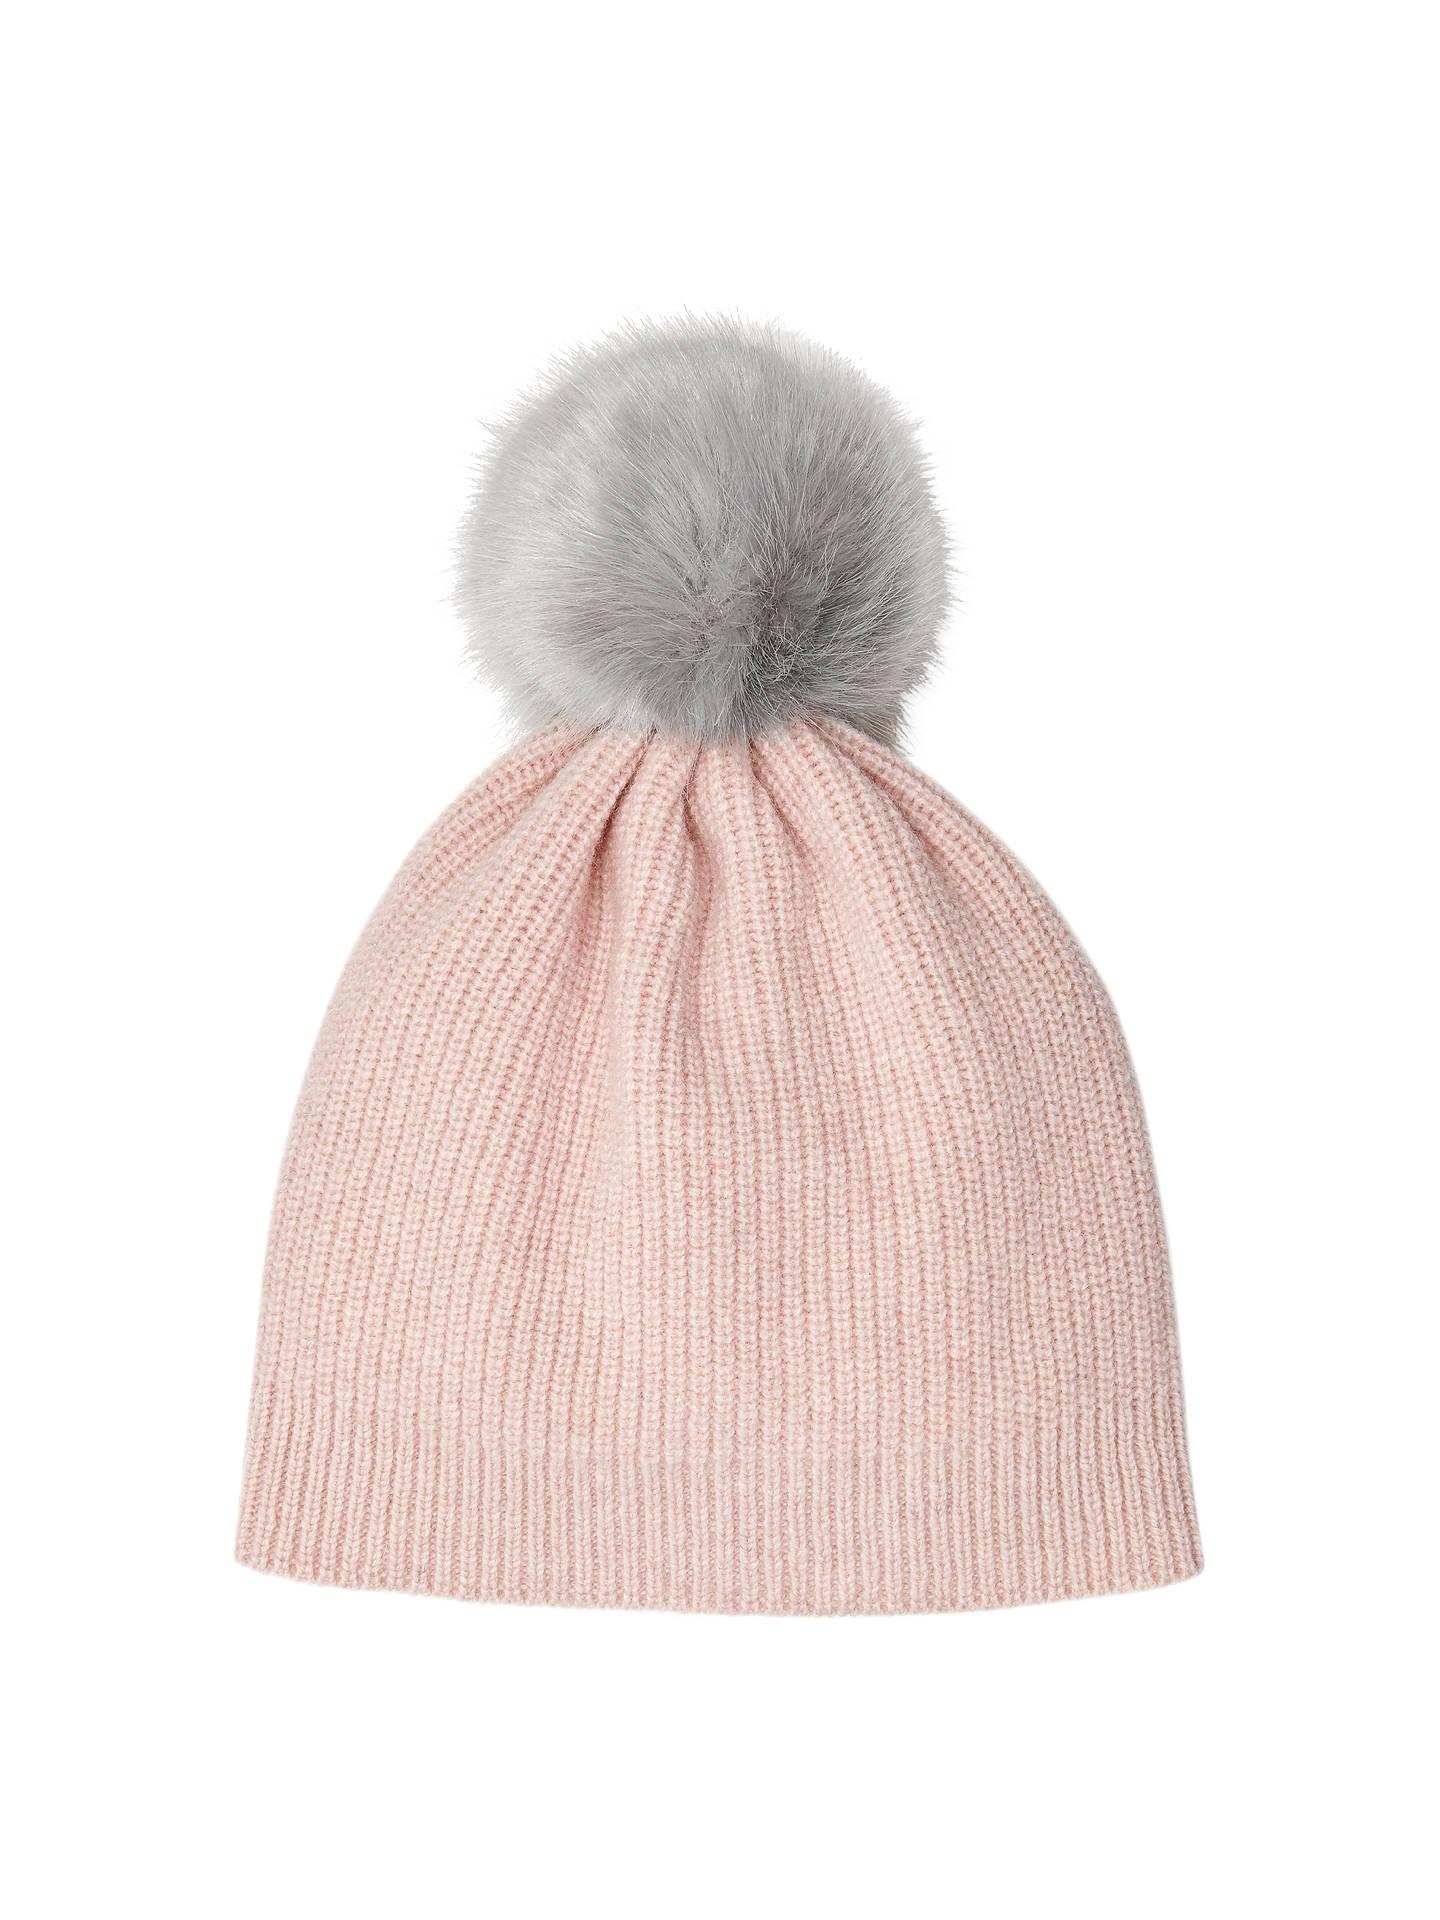 4f4906df7 Jigsaw Girls' Faux Fur Pom Hat, One Size at John Lewis & Partners